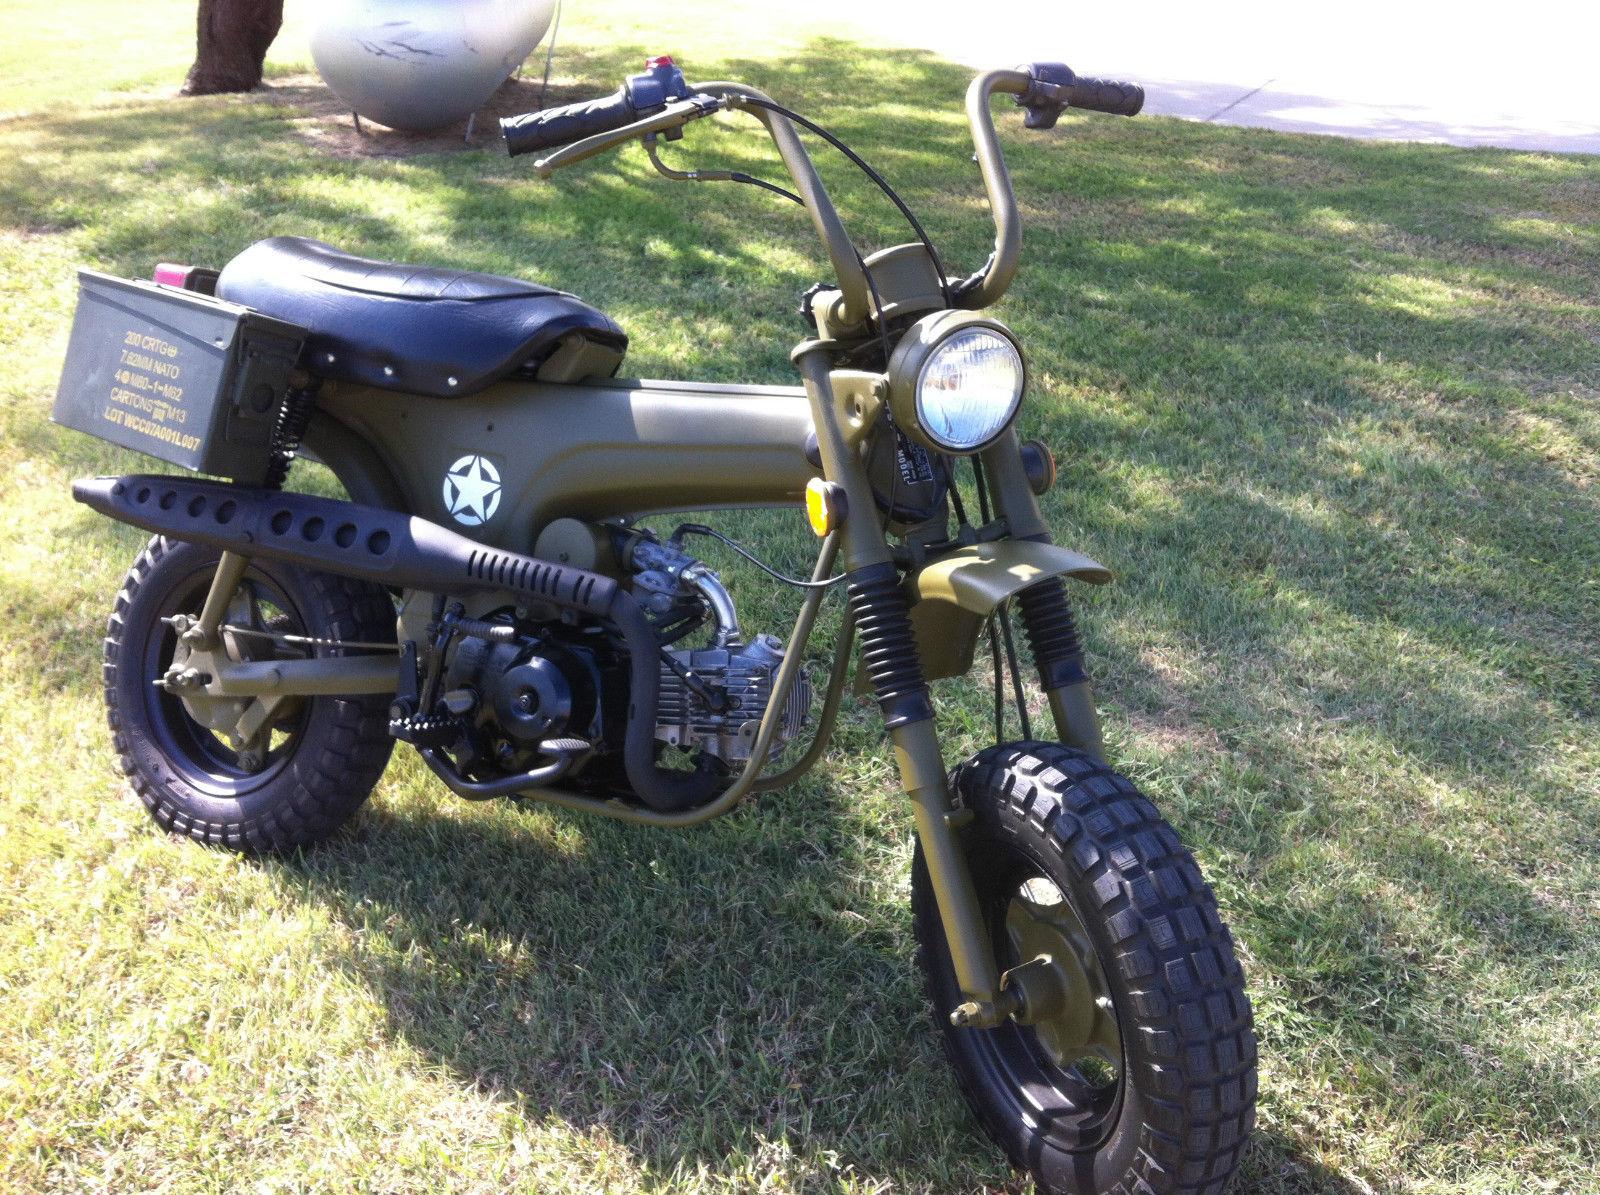 Honda Ct70 Trail Bike Restored W Military Theme 1970 Specs 1977 Ct